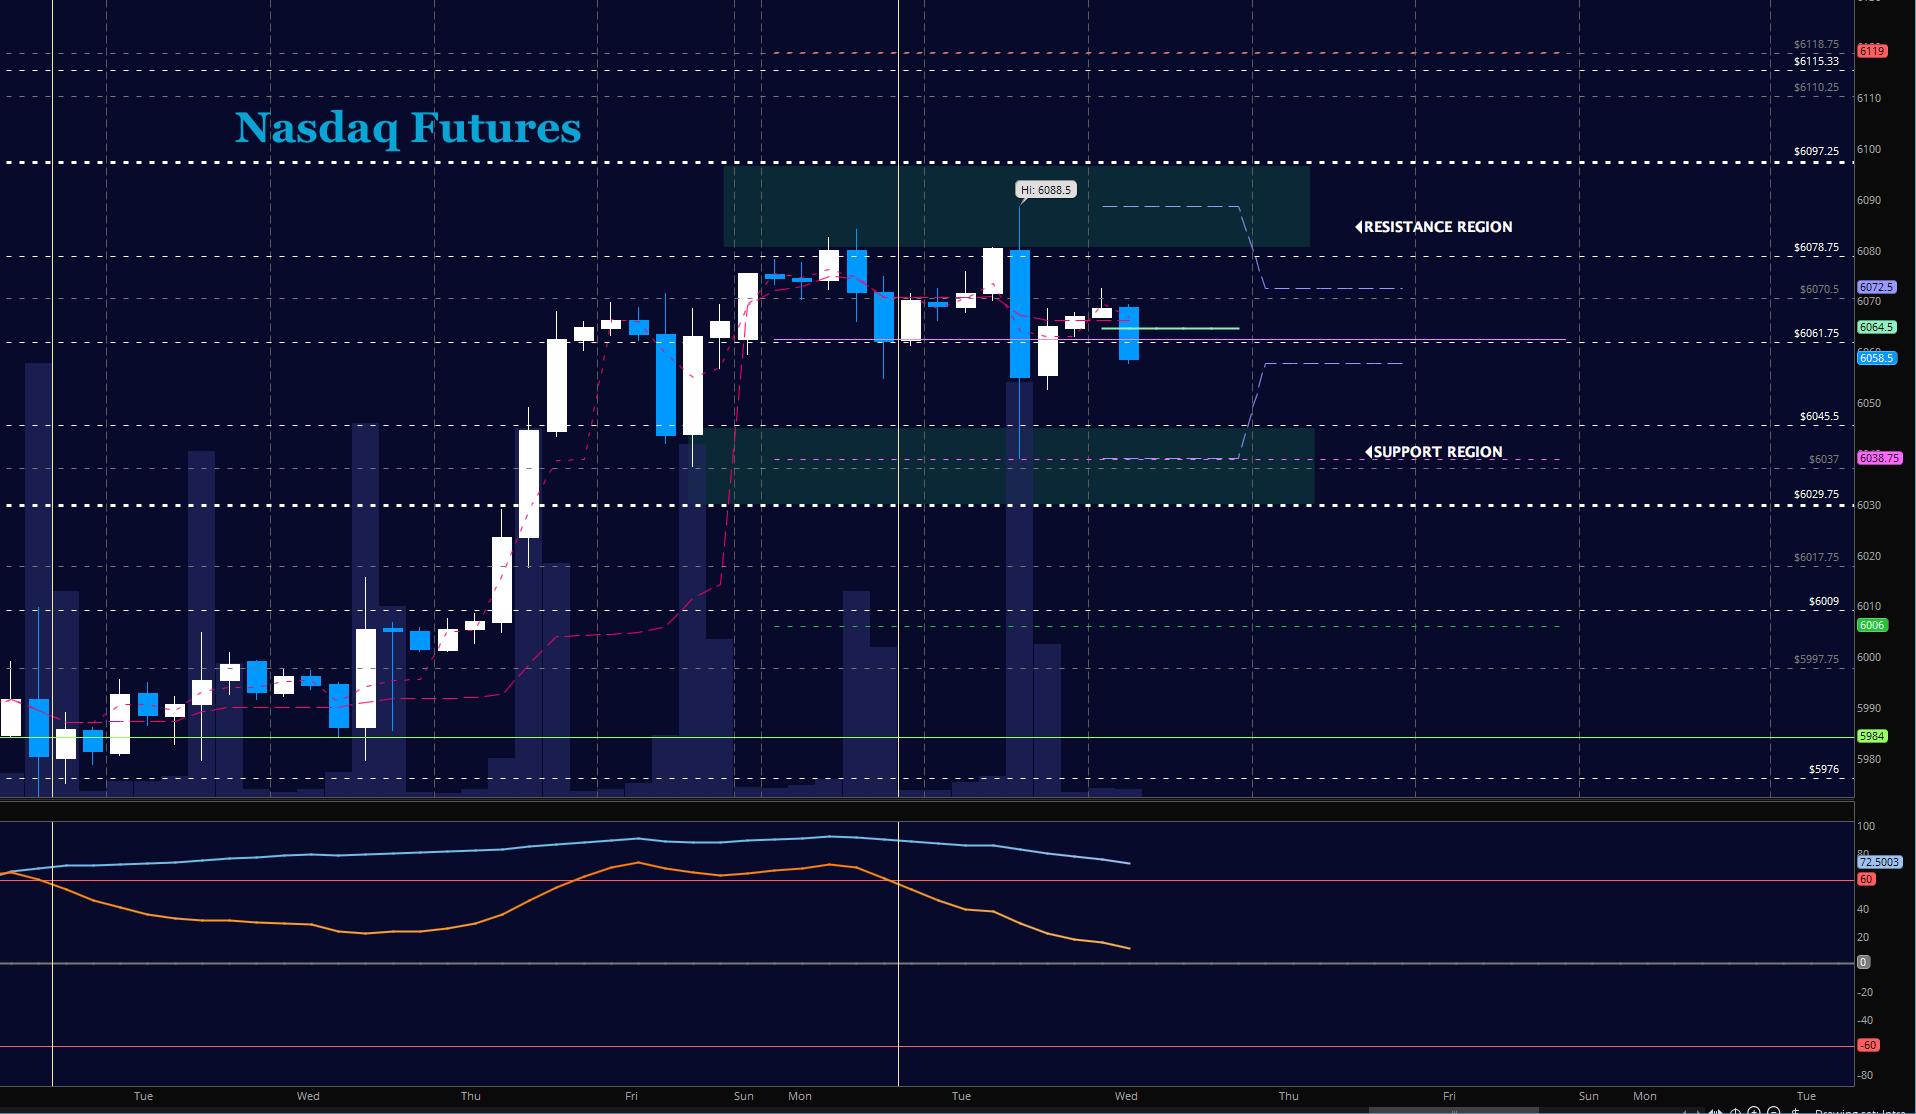 nasdaq futures trading nq price targets october 11